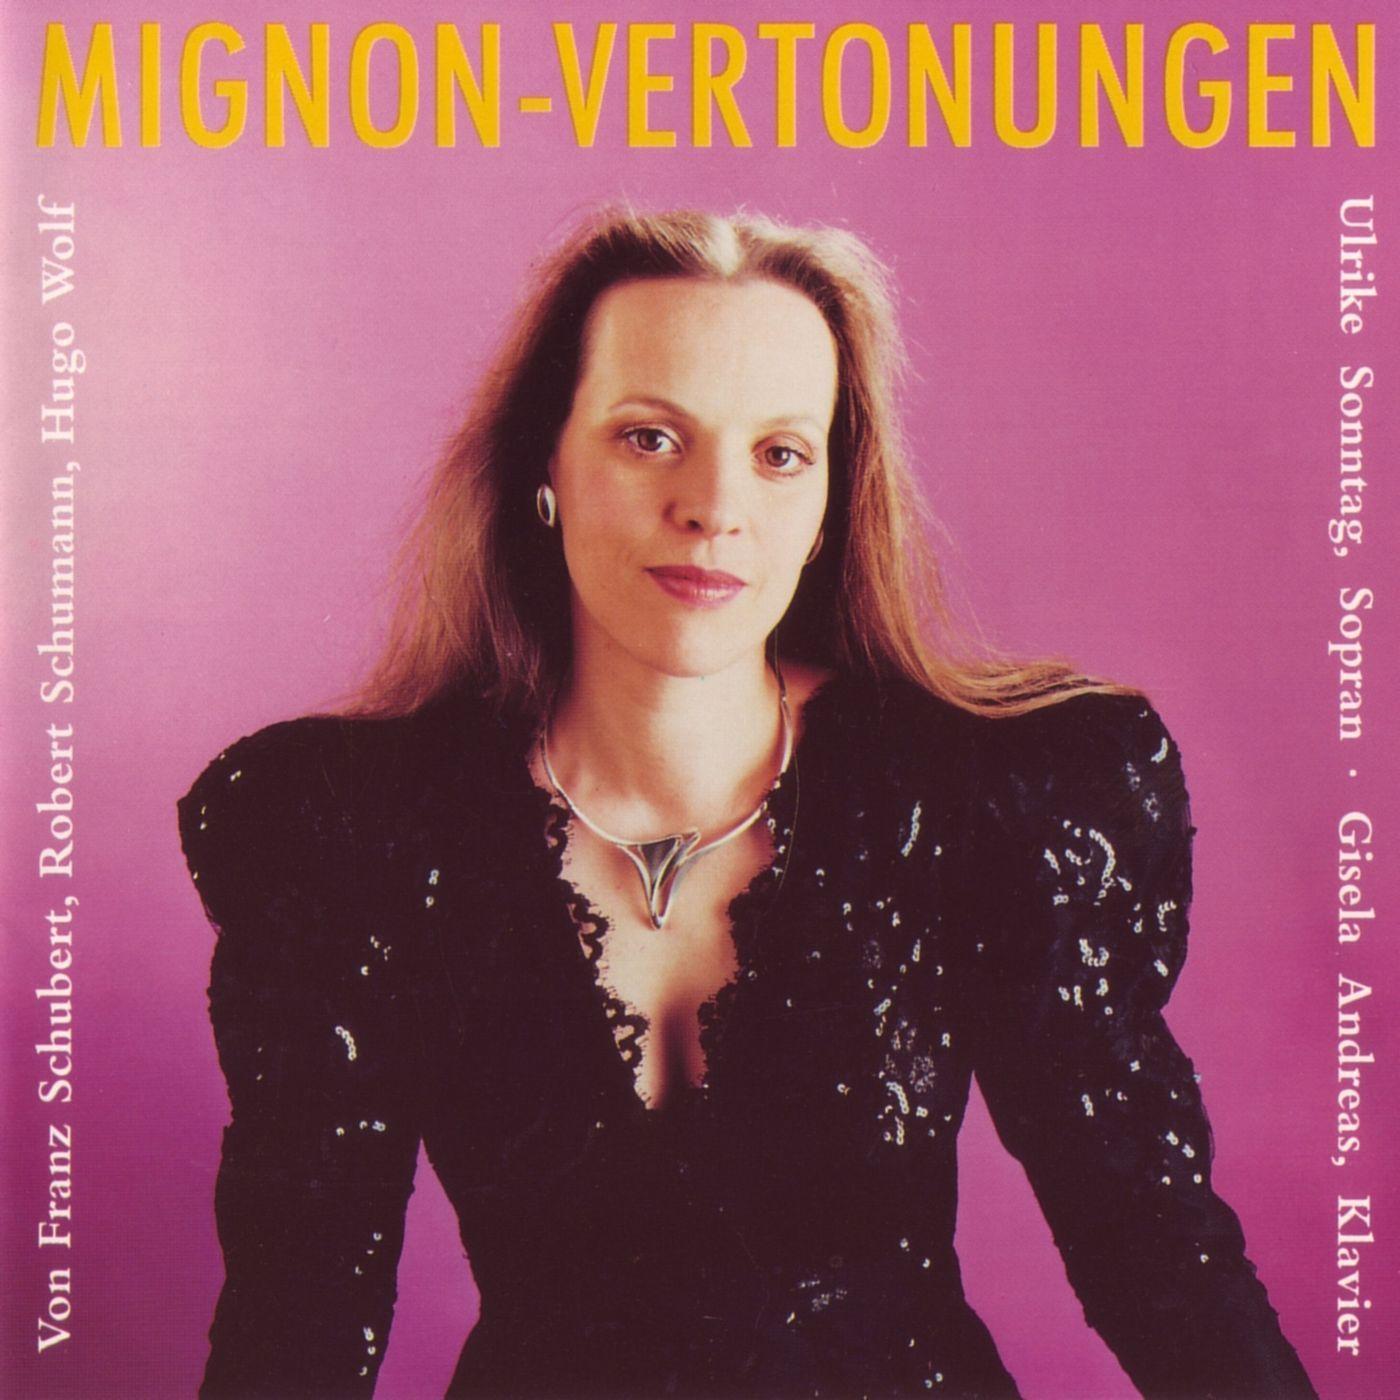 Mignon-Vertonungen